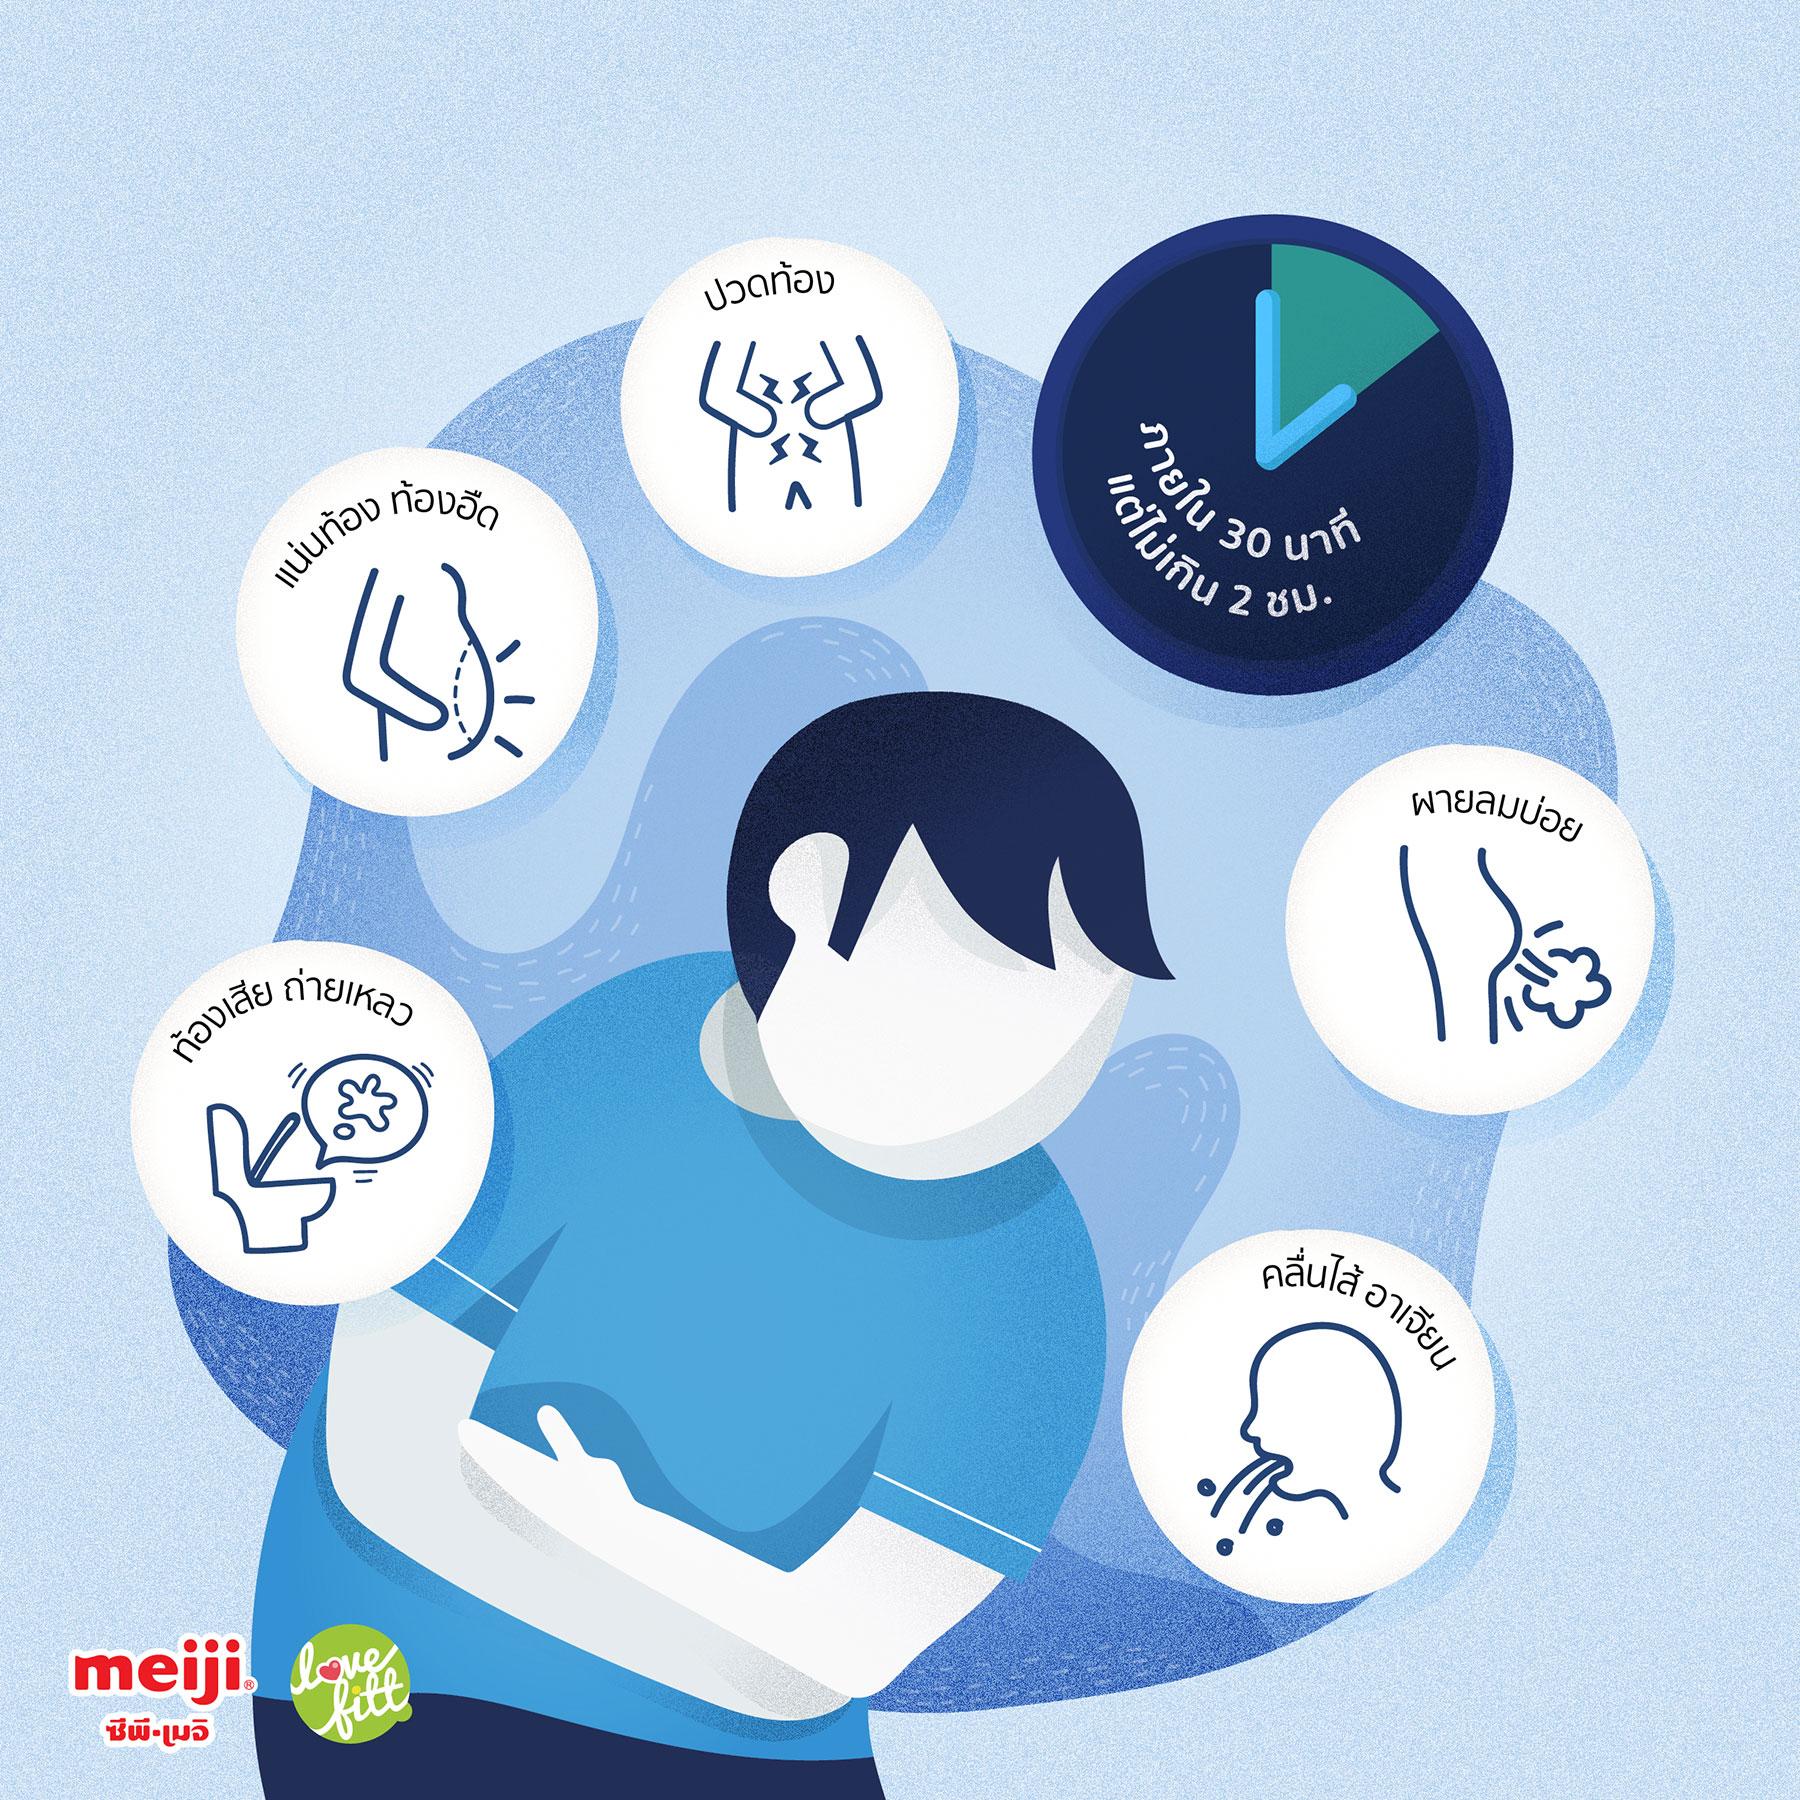 meiji-lactose-free-milk-img-03